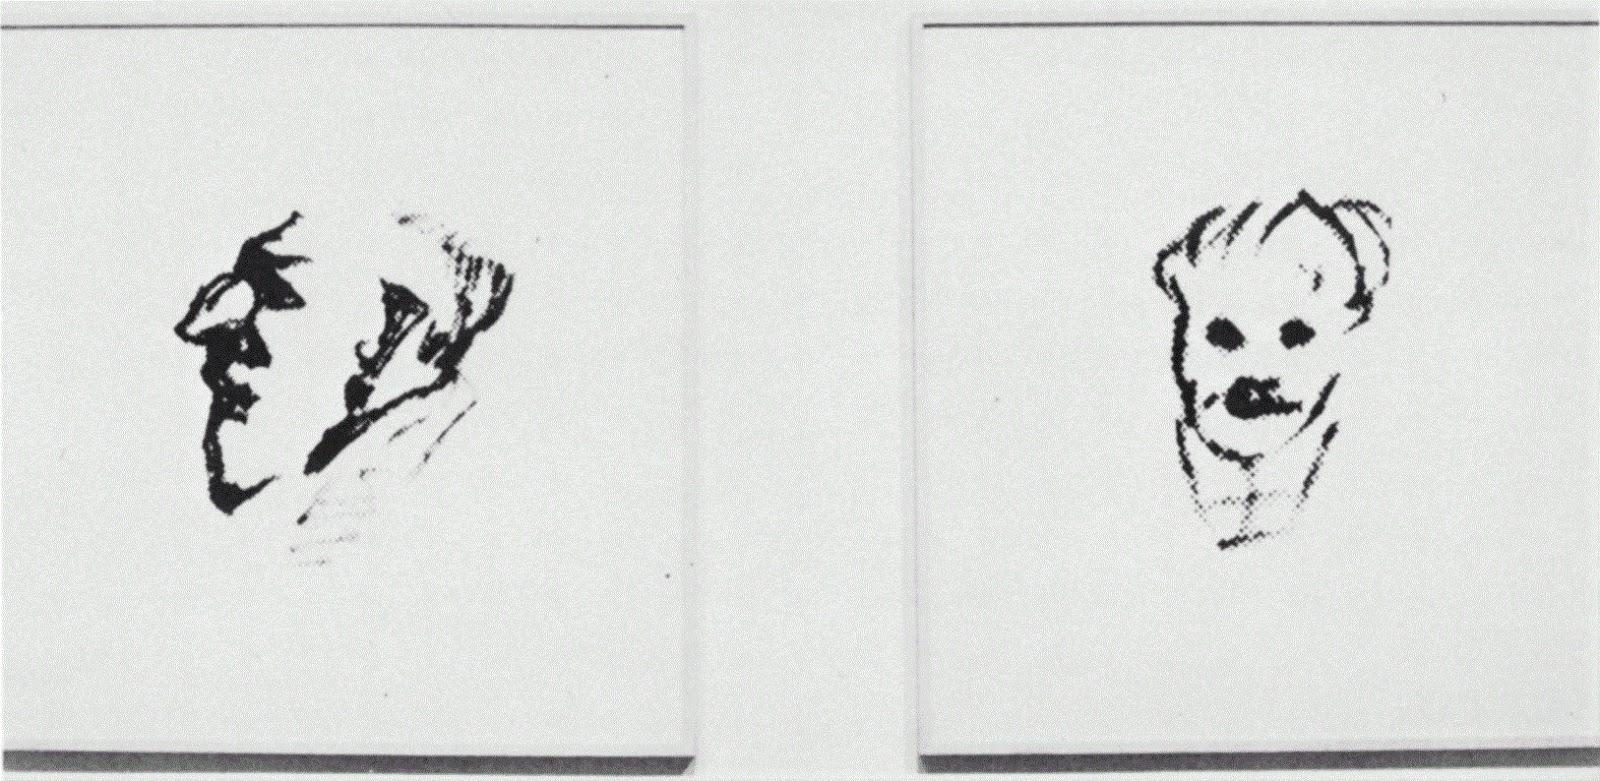 Трой Браунтух. Без названия. 1979